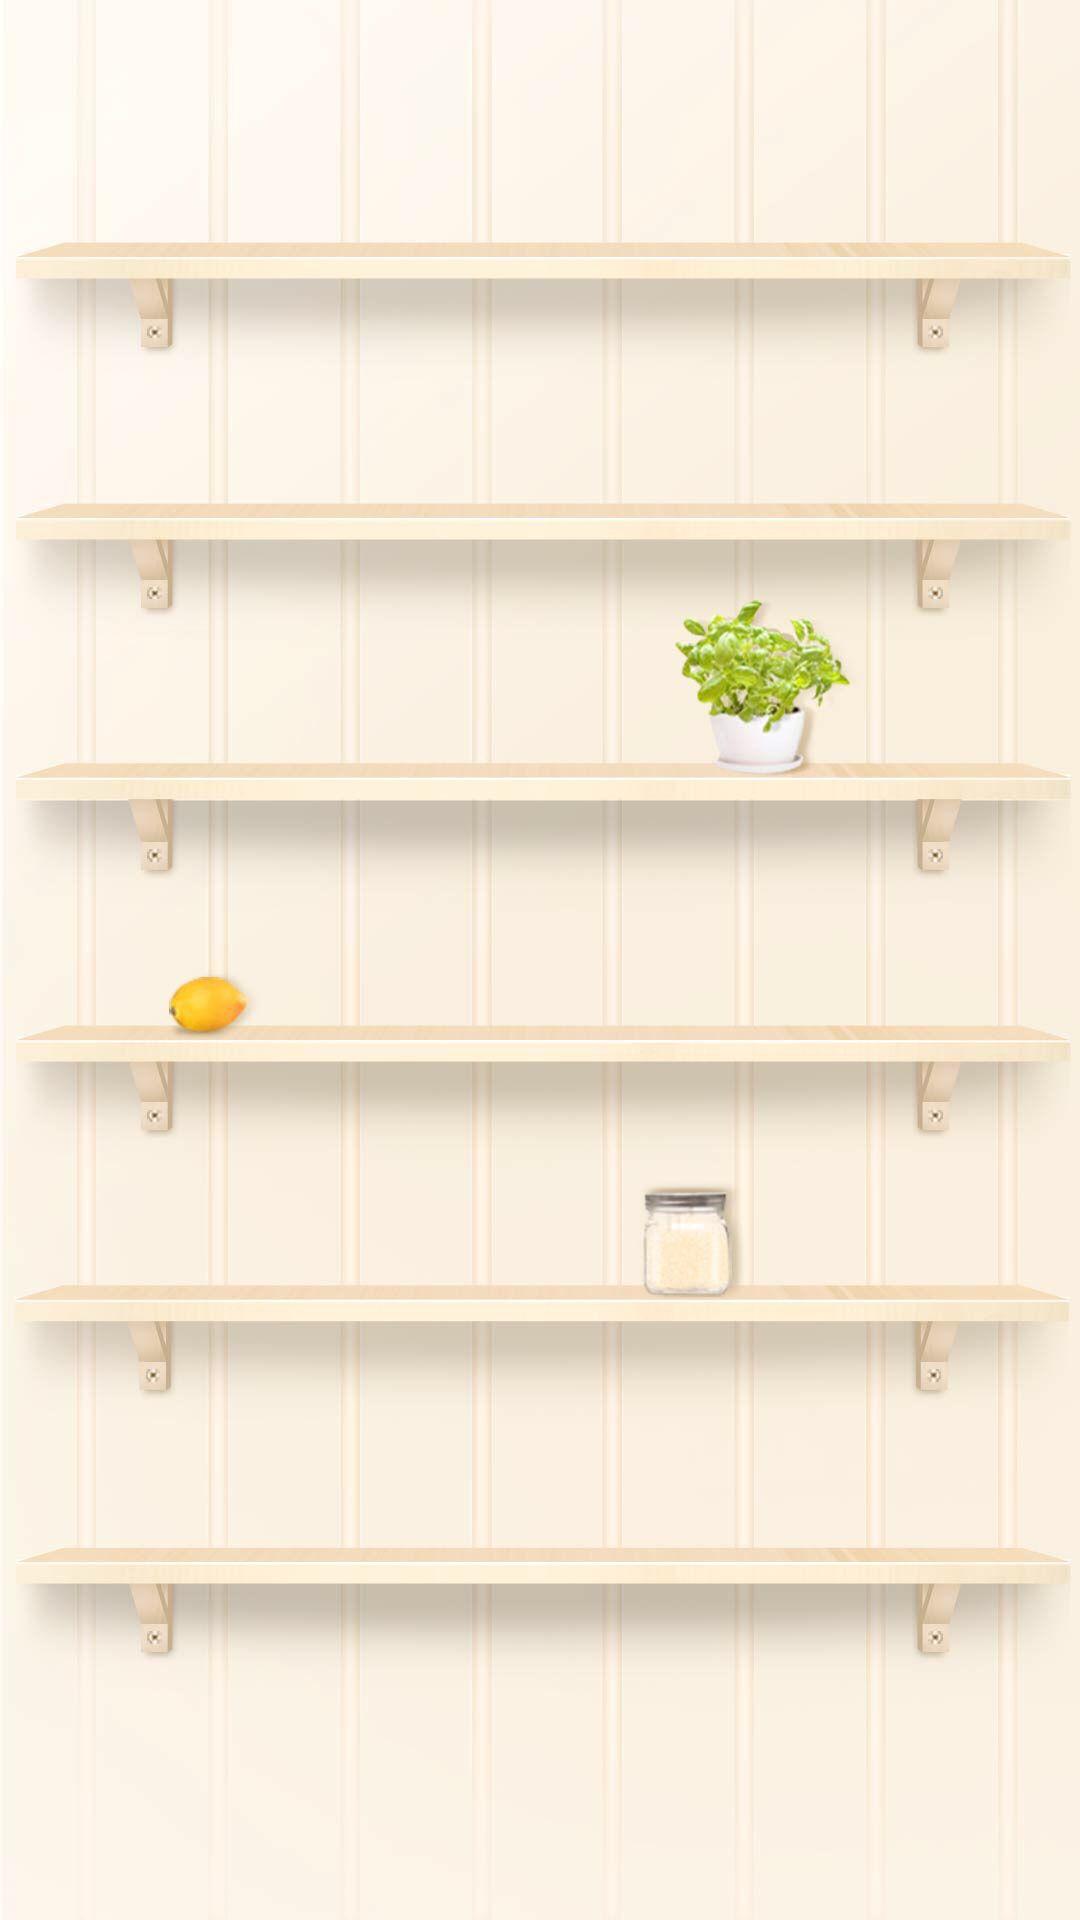 Iphone 6 Plus Home Wallpaper Shelf Wallpaper Shelves Ipad Wallpaper Iphone Background Wallpaper